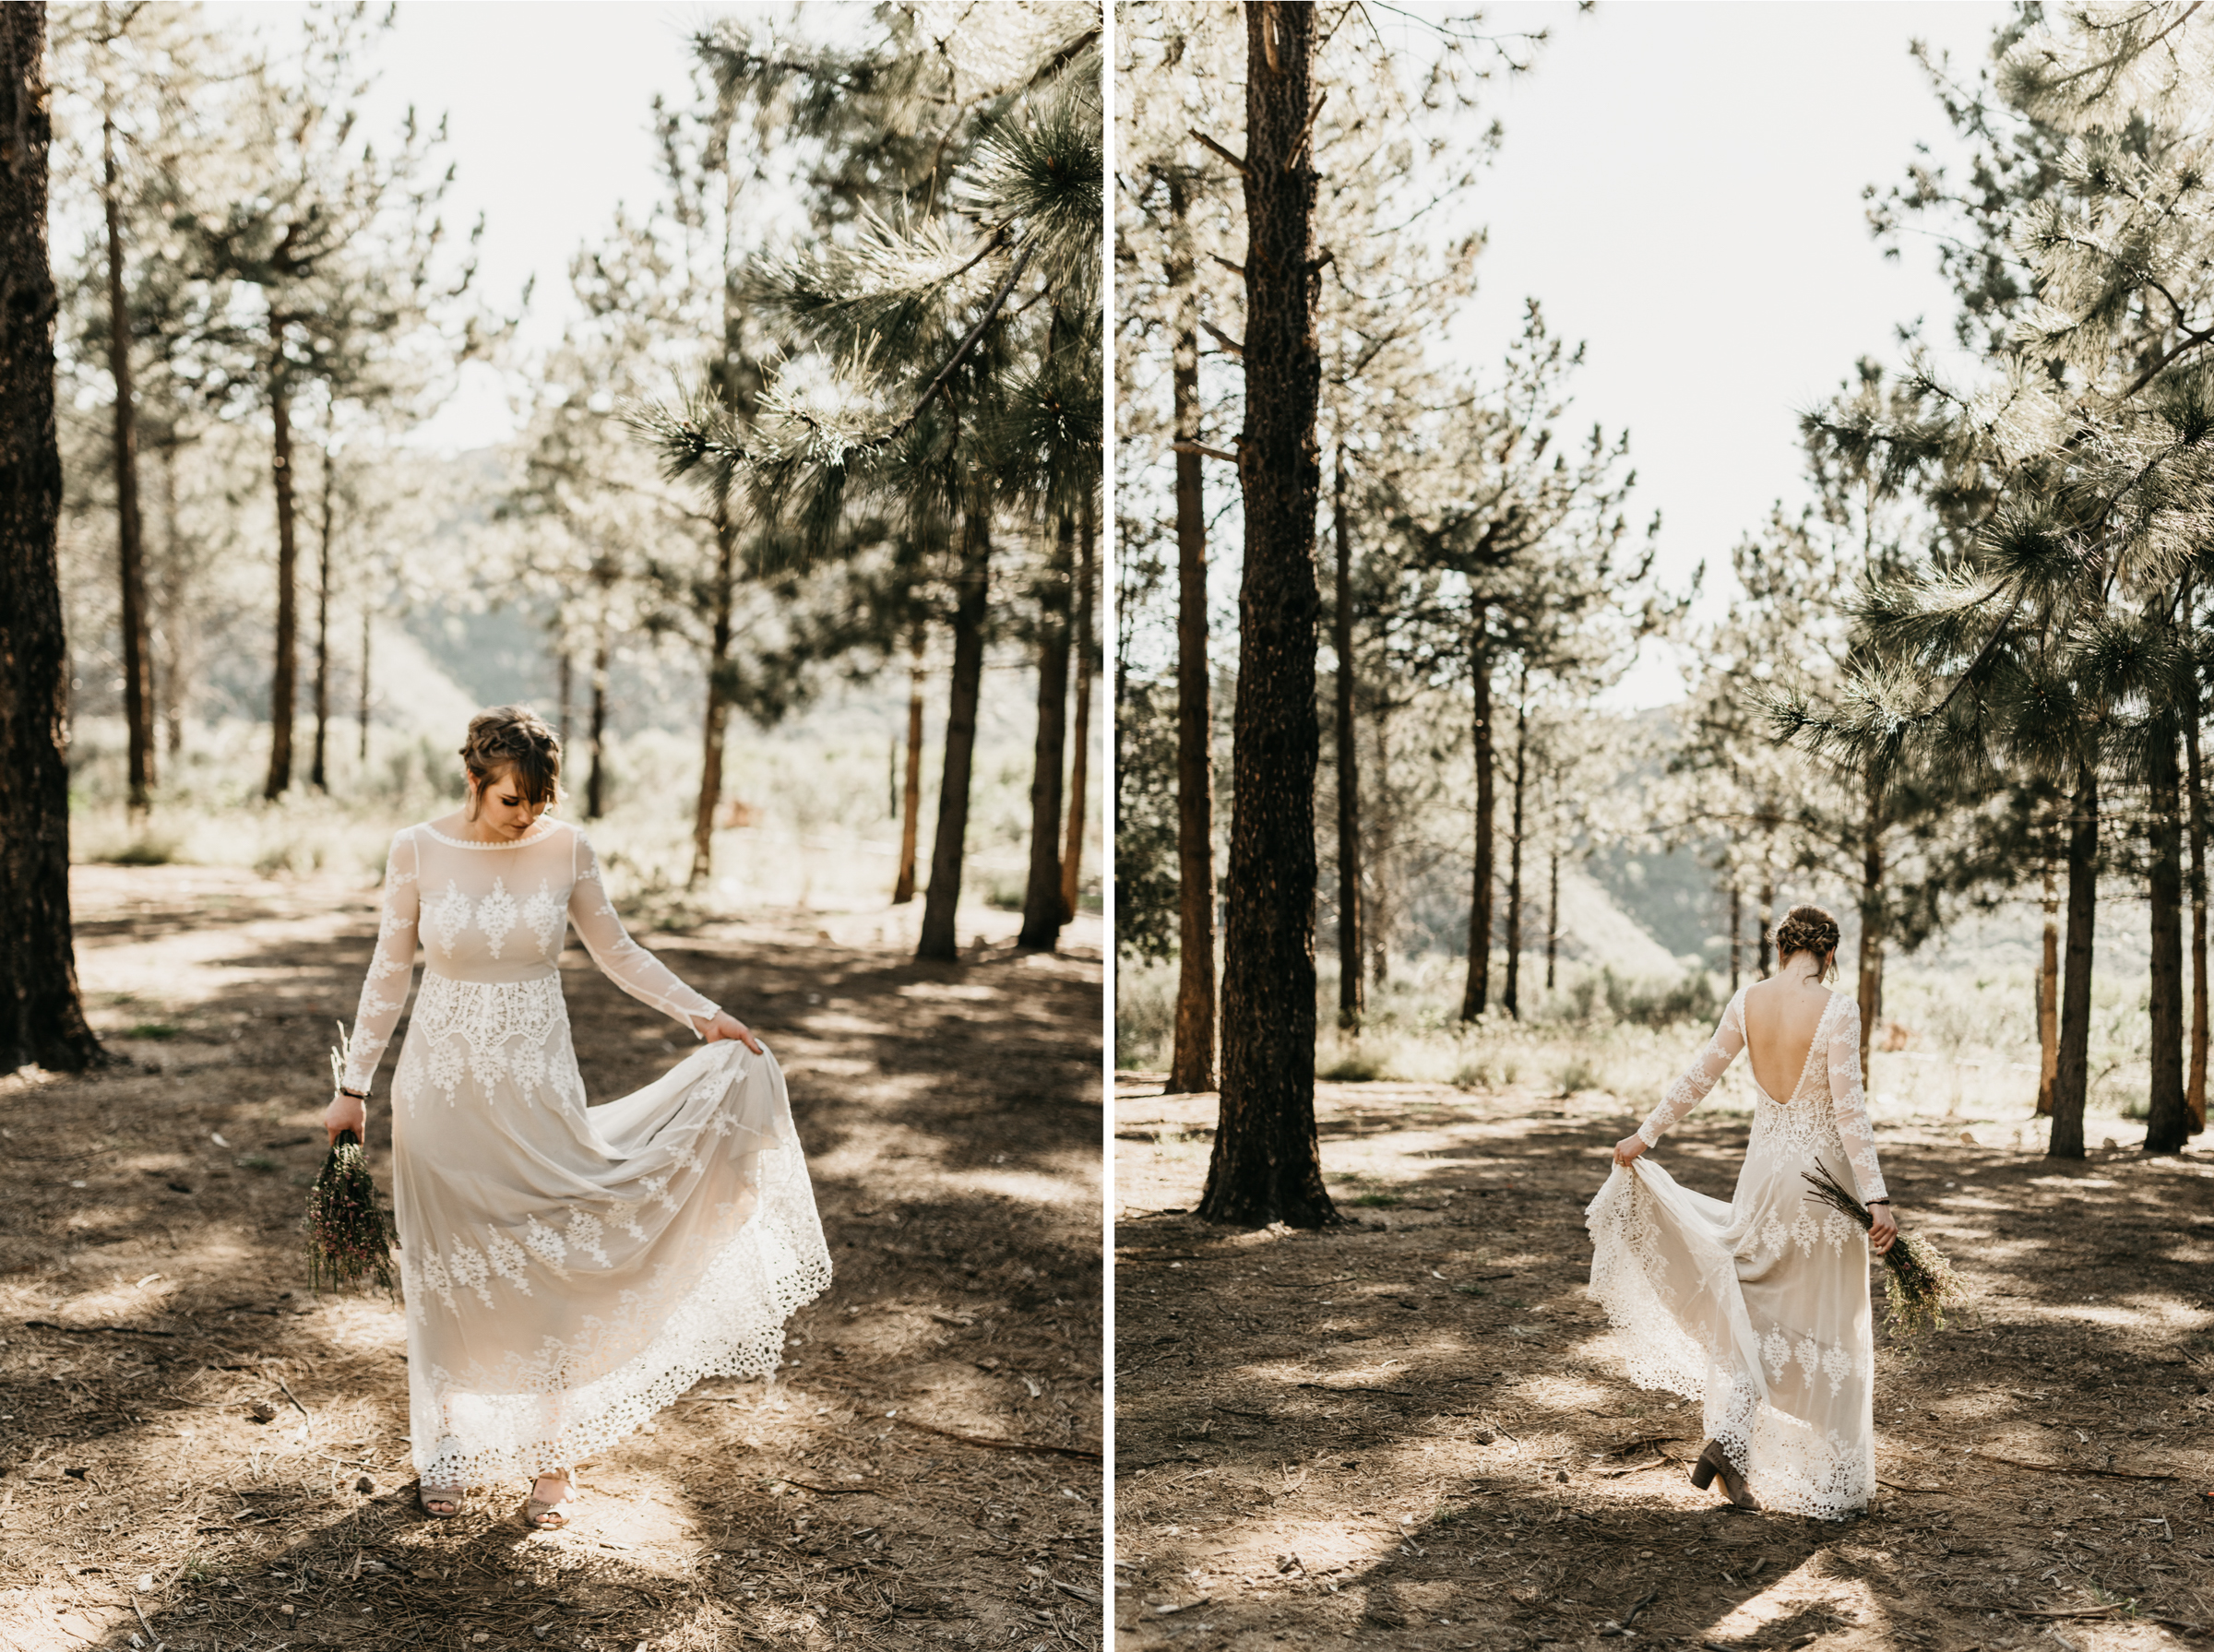 ©Isaiah + Taylor Photography - Los Angeles Wedding Photographers - Los Angeles Forest Wedding -7.jpg